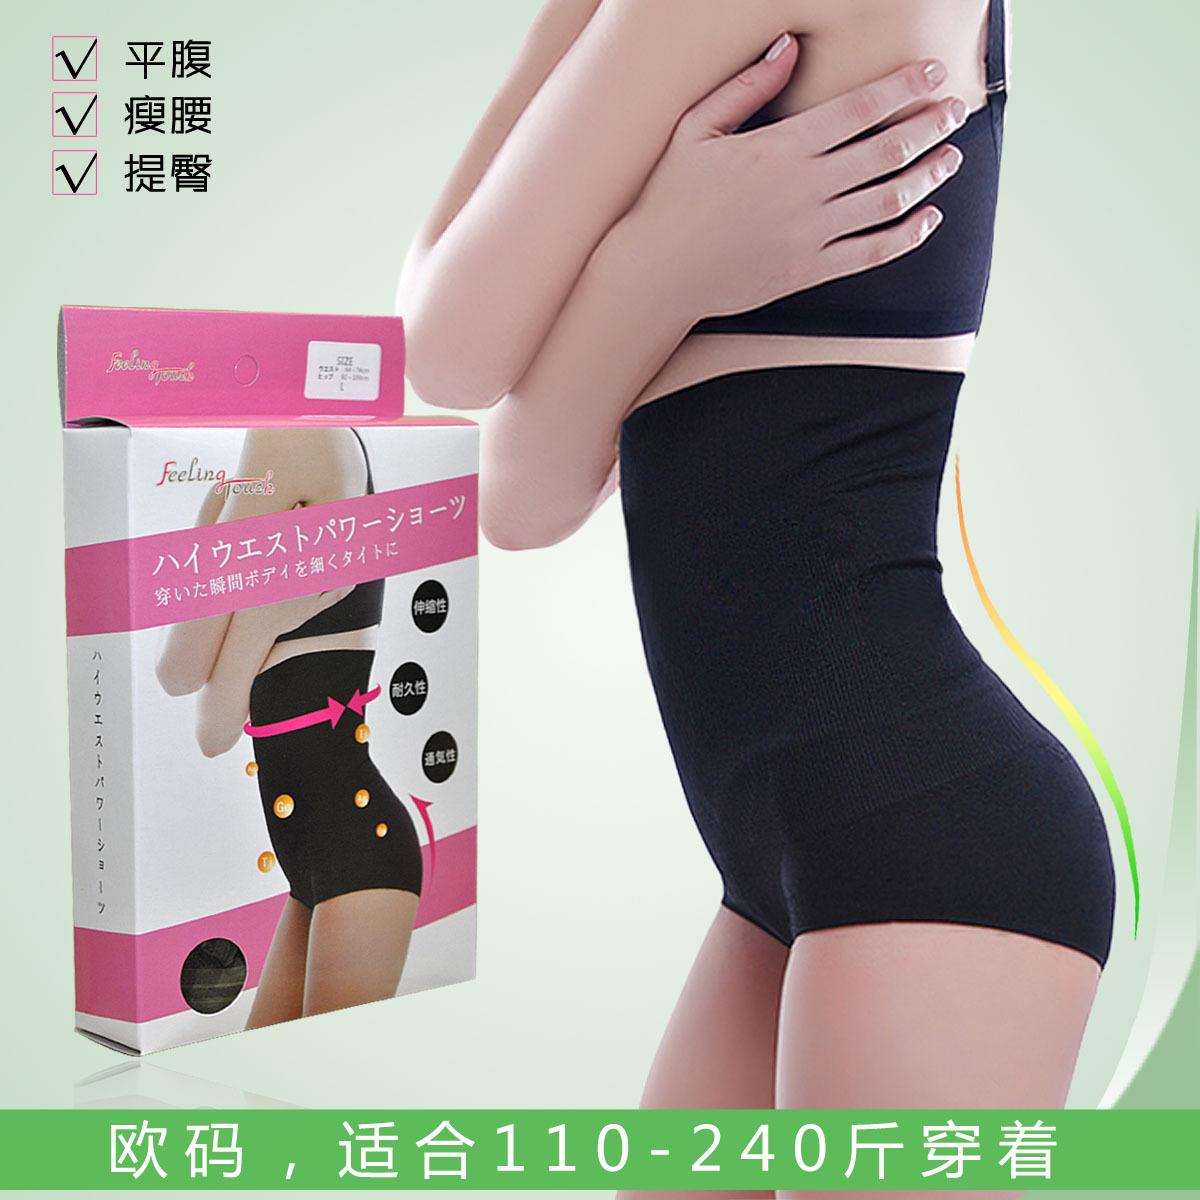 Plus size beauty care body shaping pants body shaping panties ultra high waist abdomen drawing butt-lifting female 110 - 240